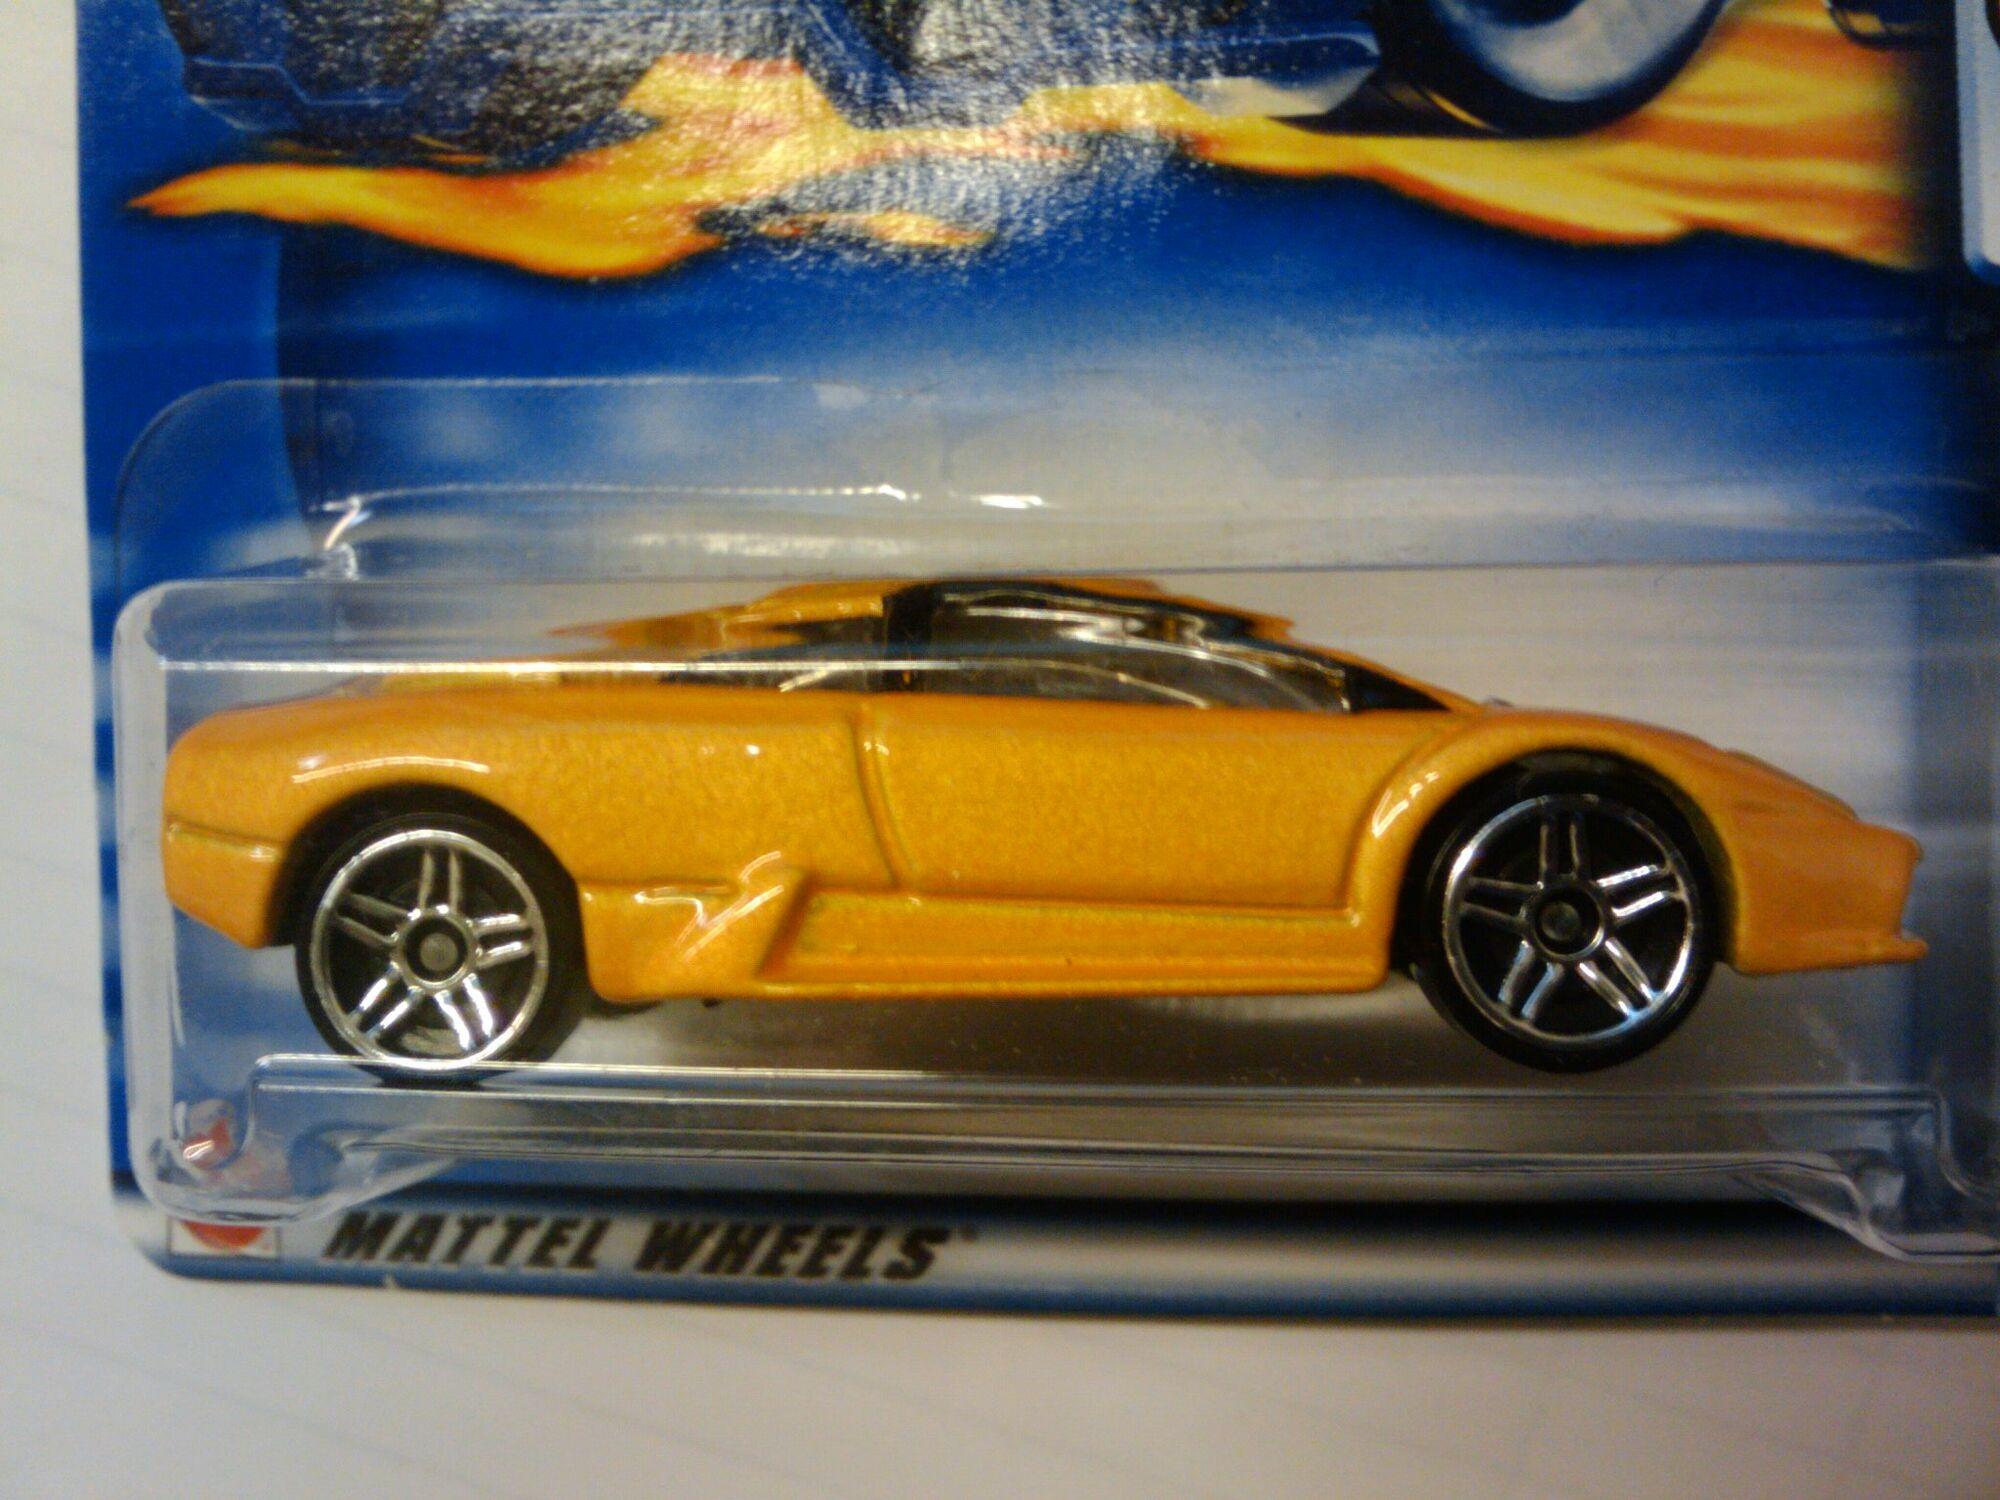 2000?cb=20100512183746 Surprising Lamborghini Gallardo Hot Wheels Wiki Cars Trend